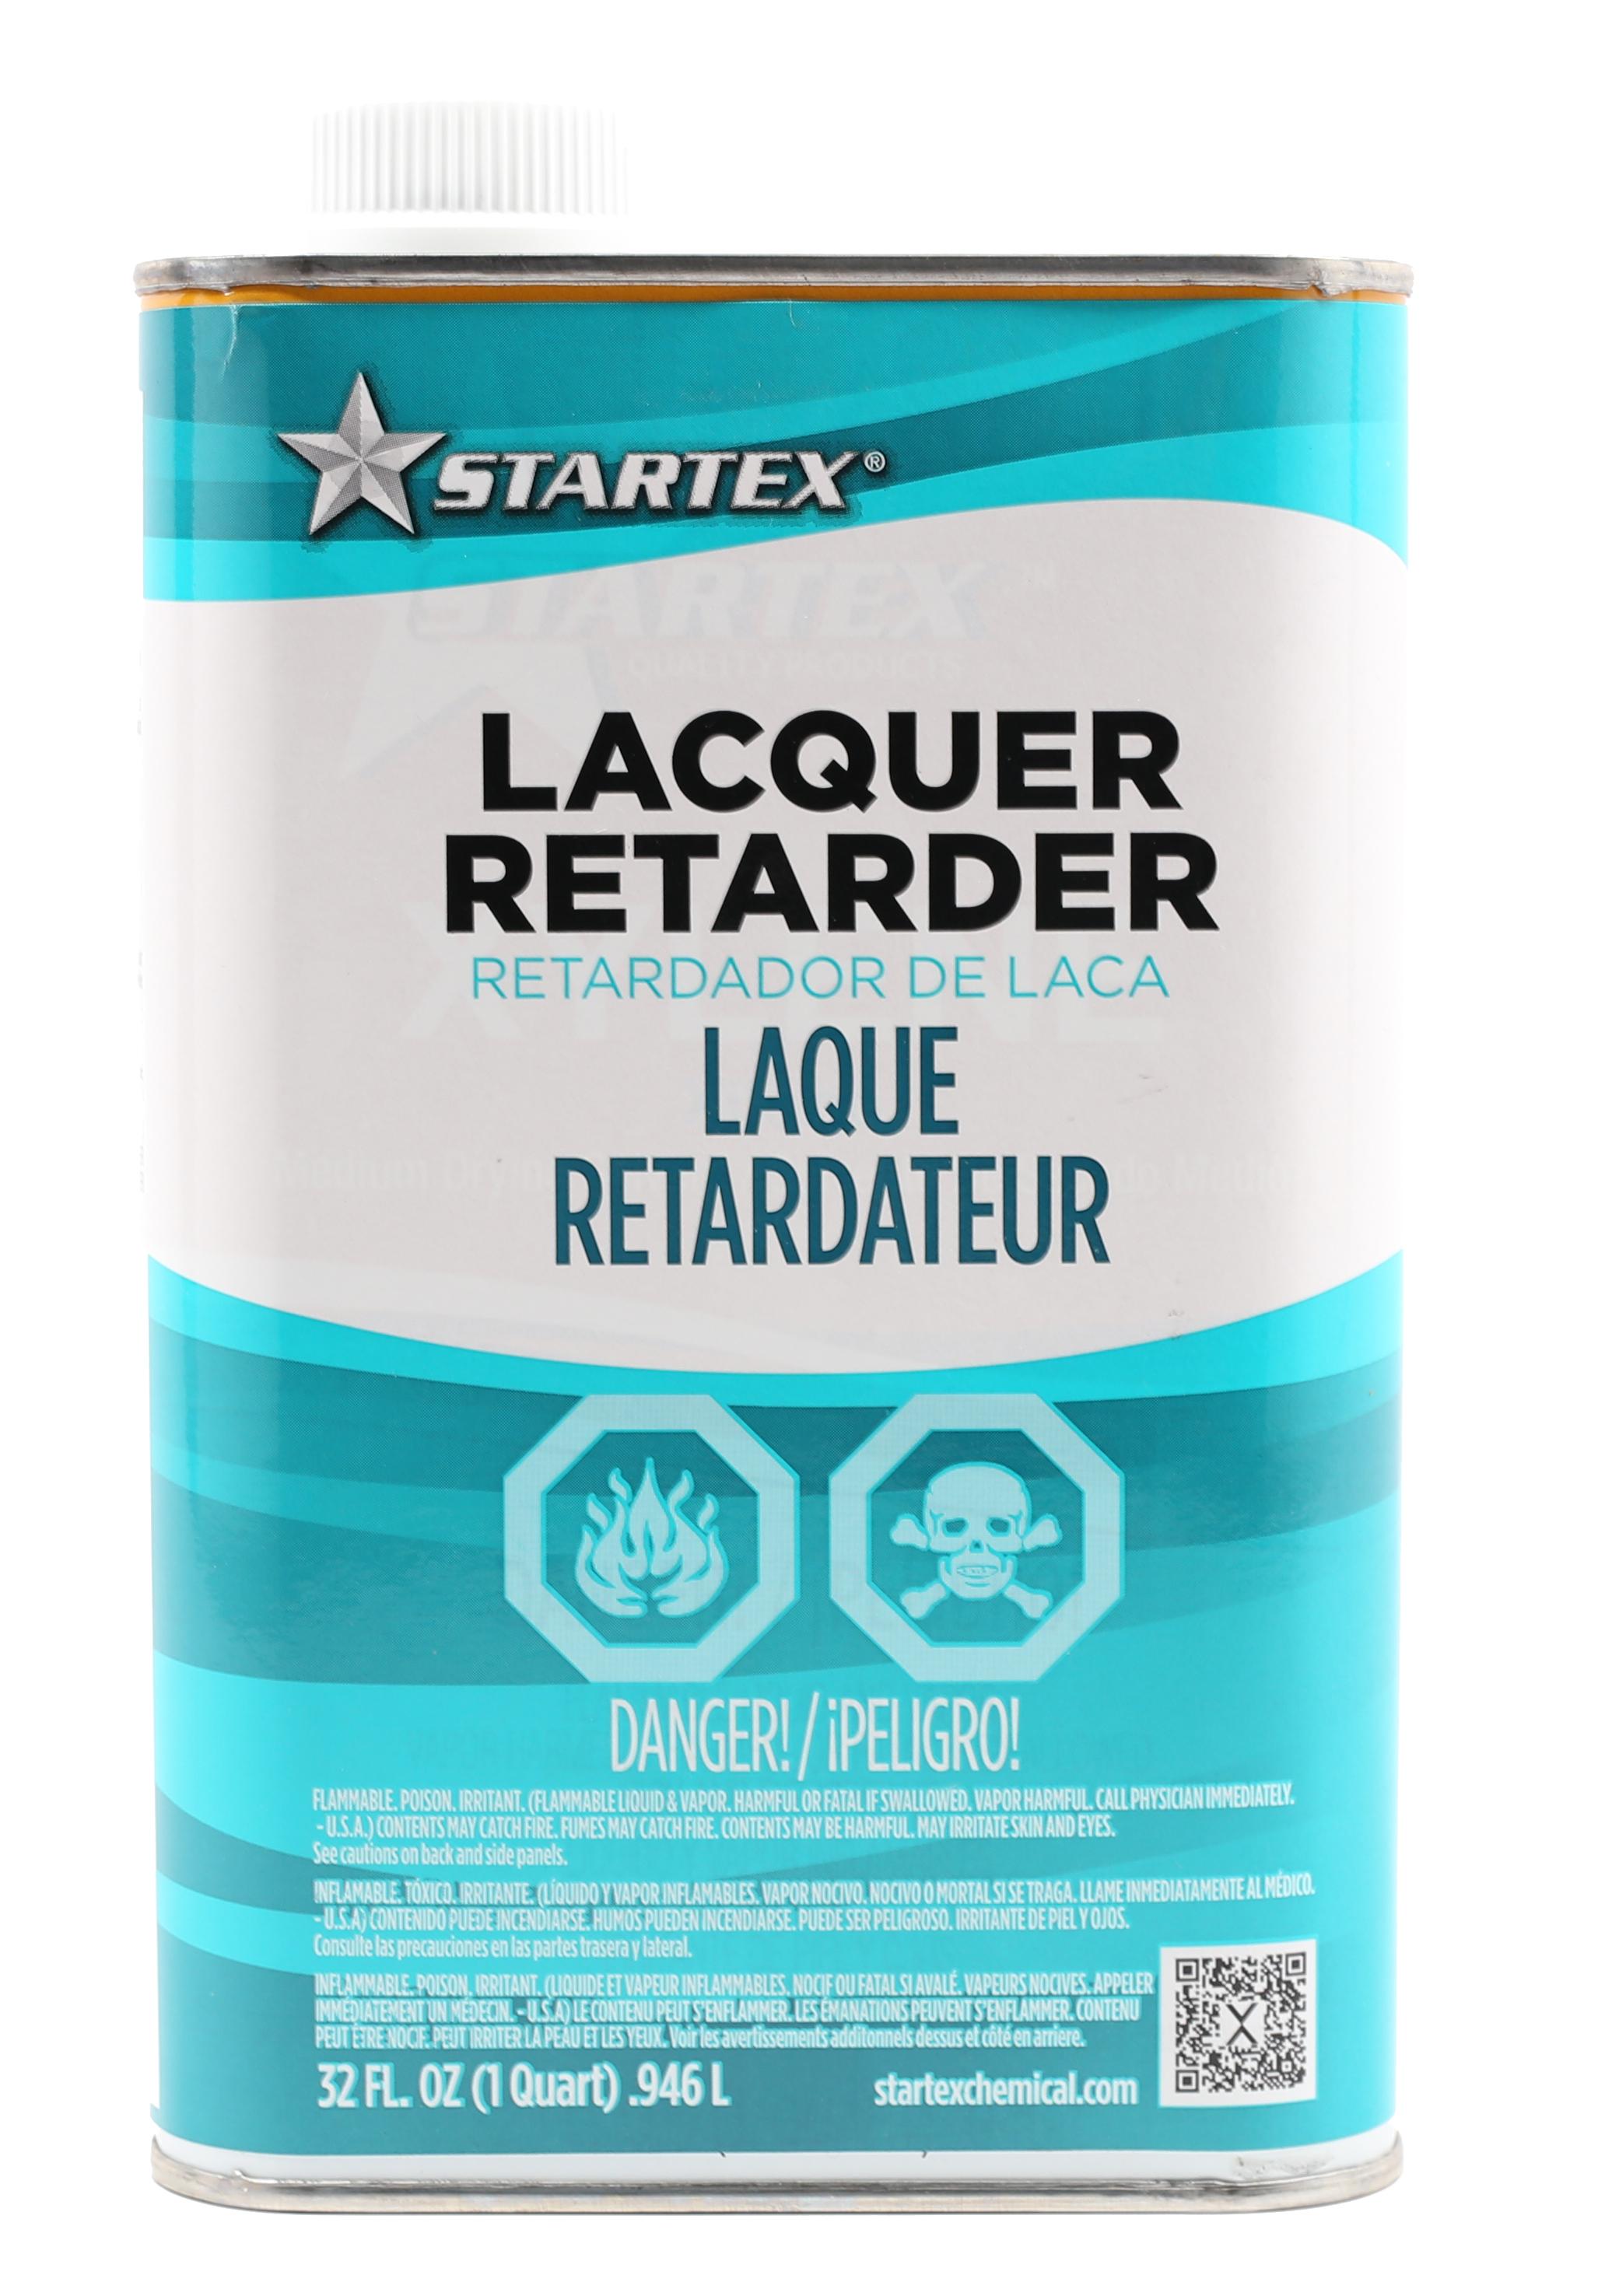 one quart lacquer retarder for paint application